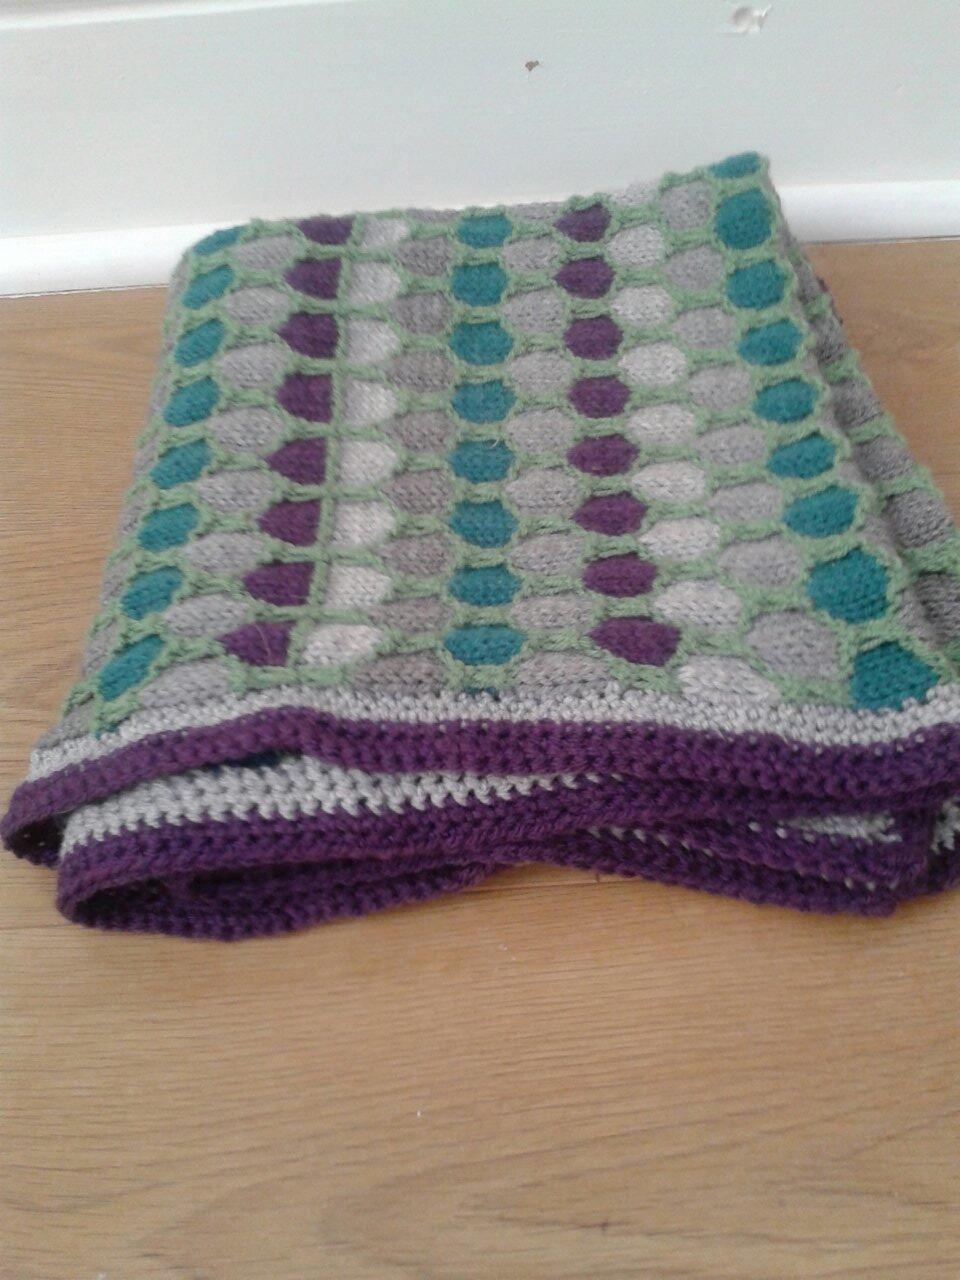 Honeycomb blanket with crochet edging | Baby knitting | Pinterest ...